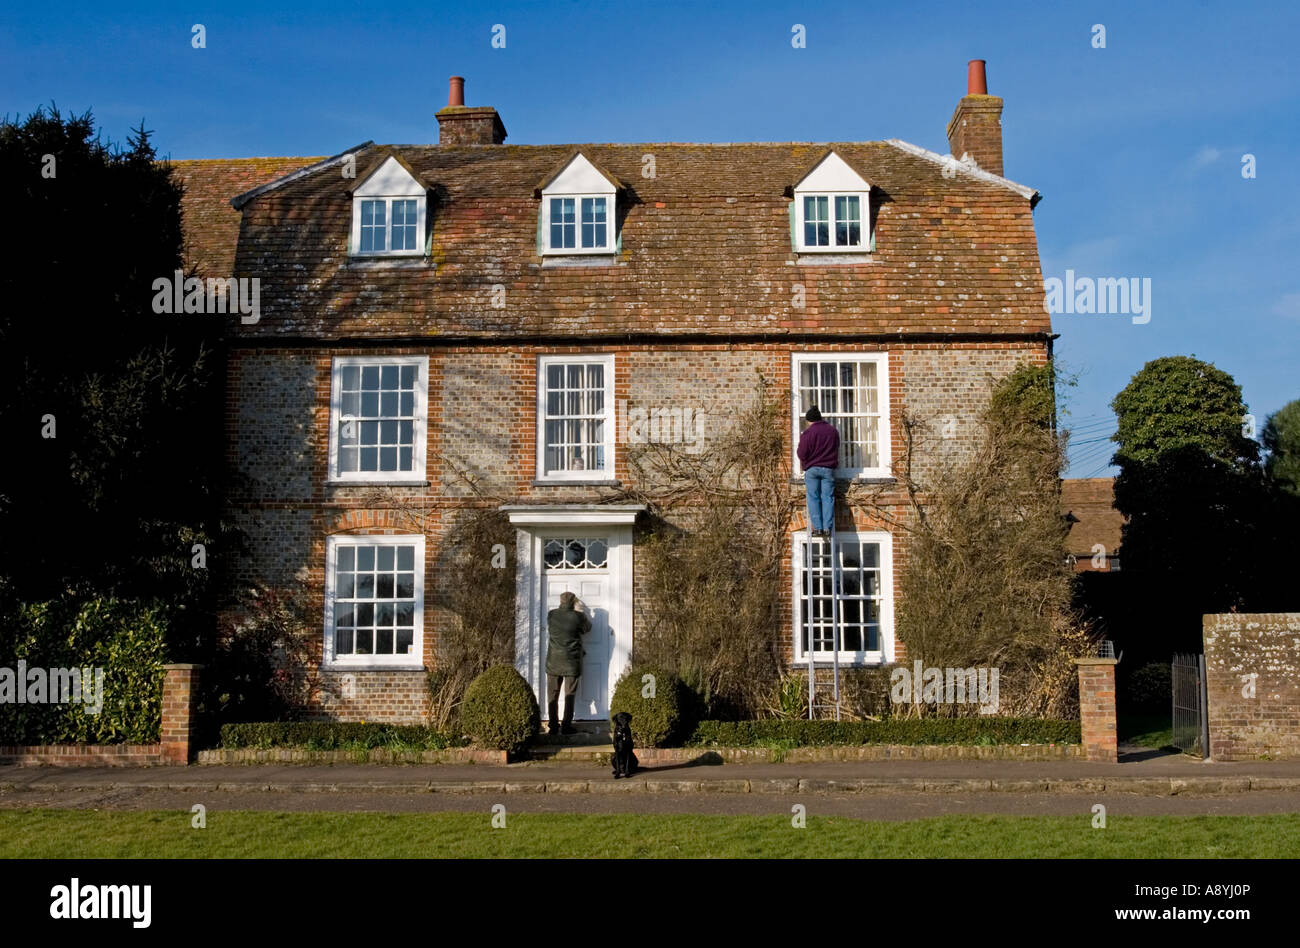 Georgian Cottage - Thame - Oxfordshire - Stock Image